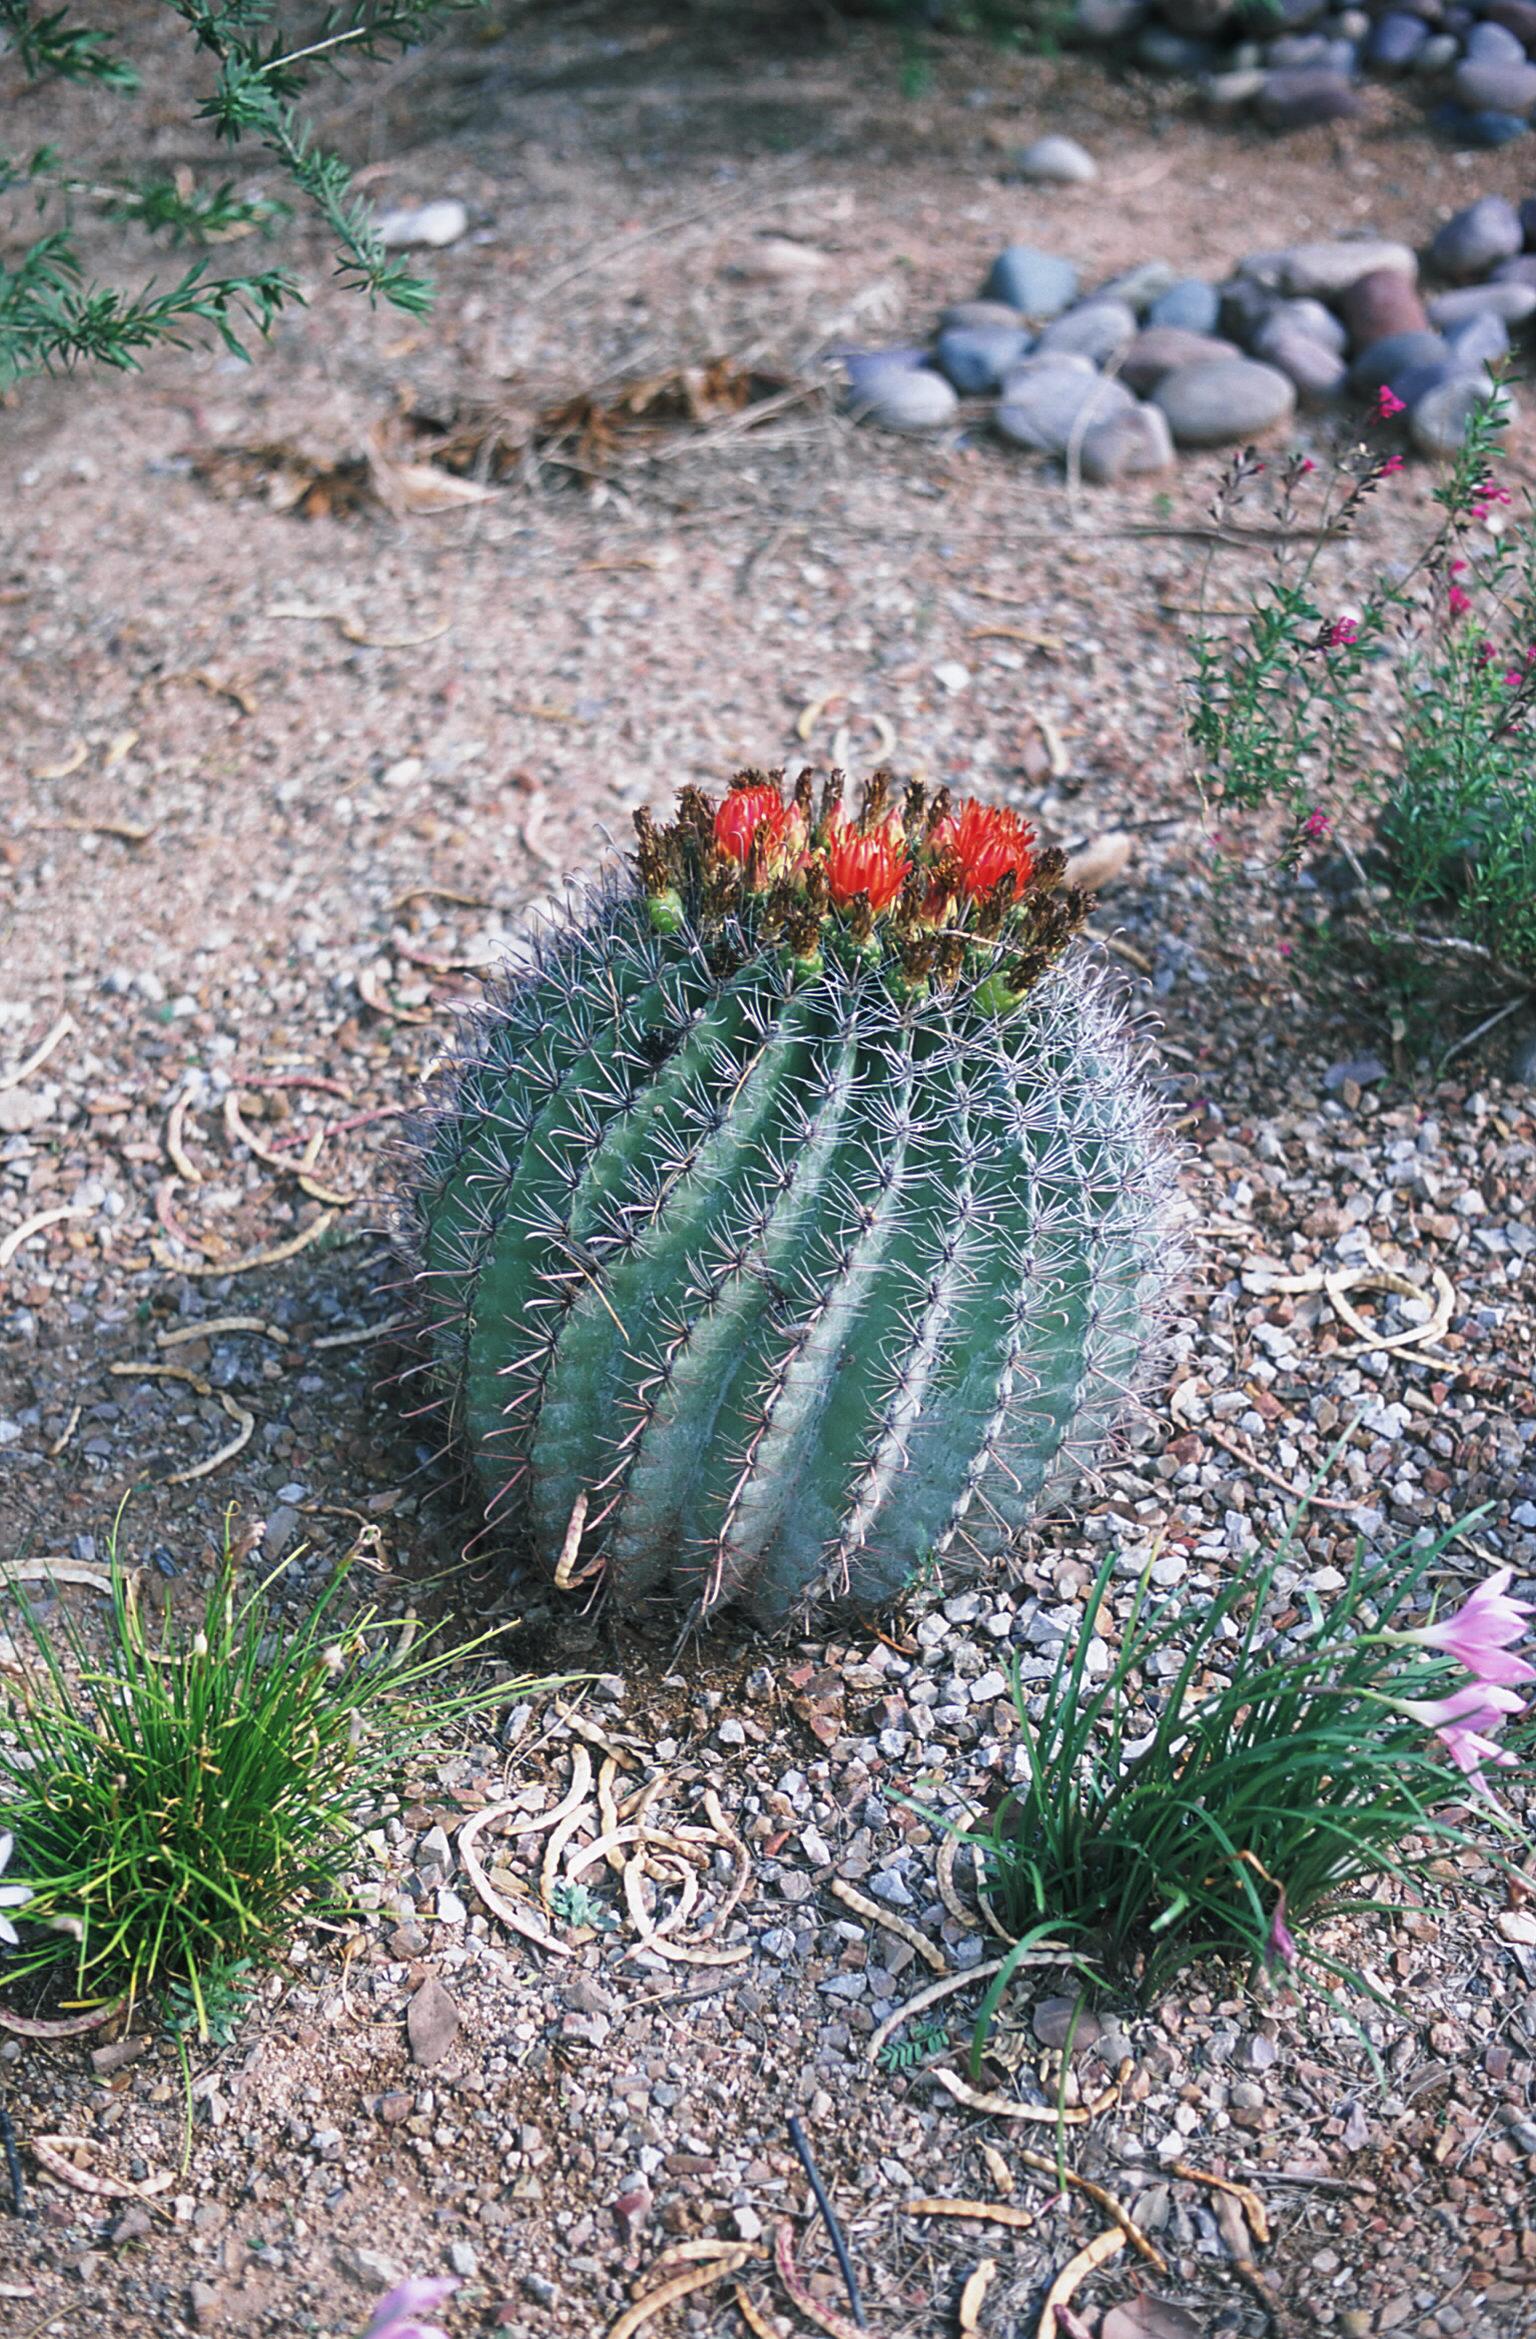 Barrel Cactus Fruit Barrel Cactus Can Make a